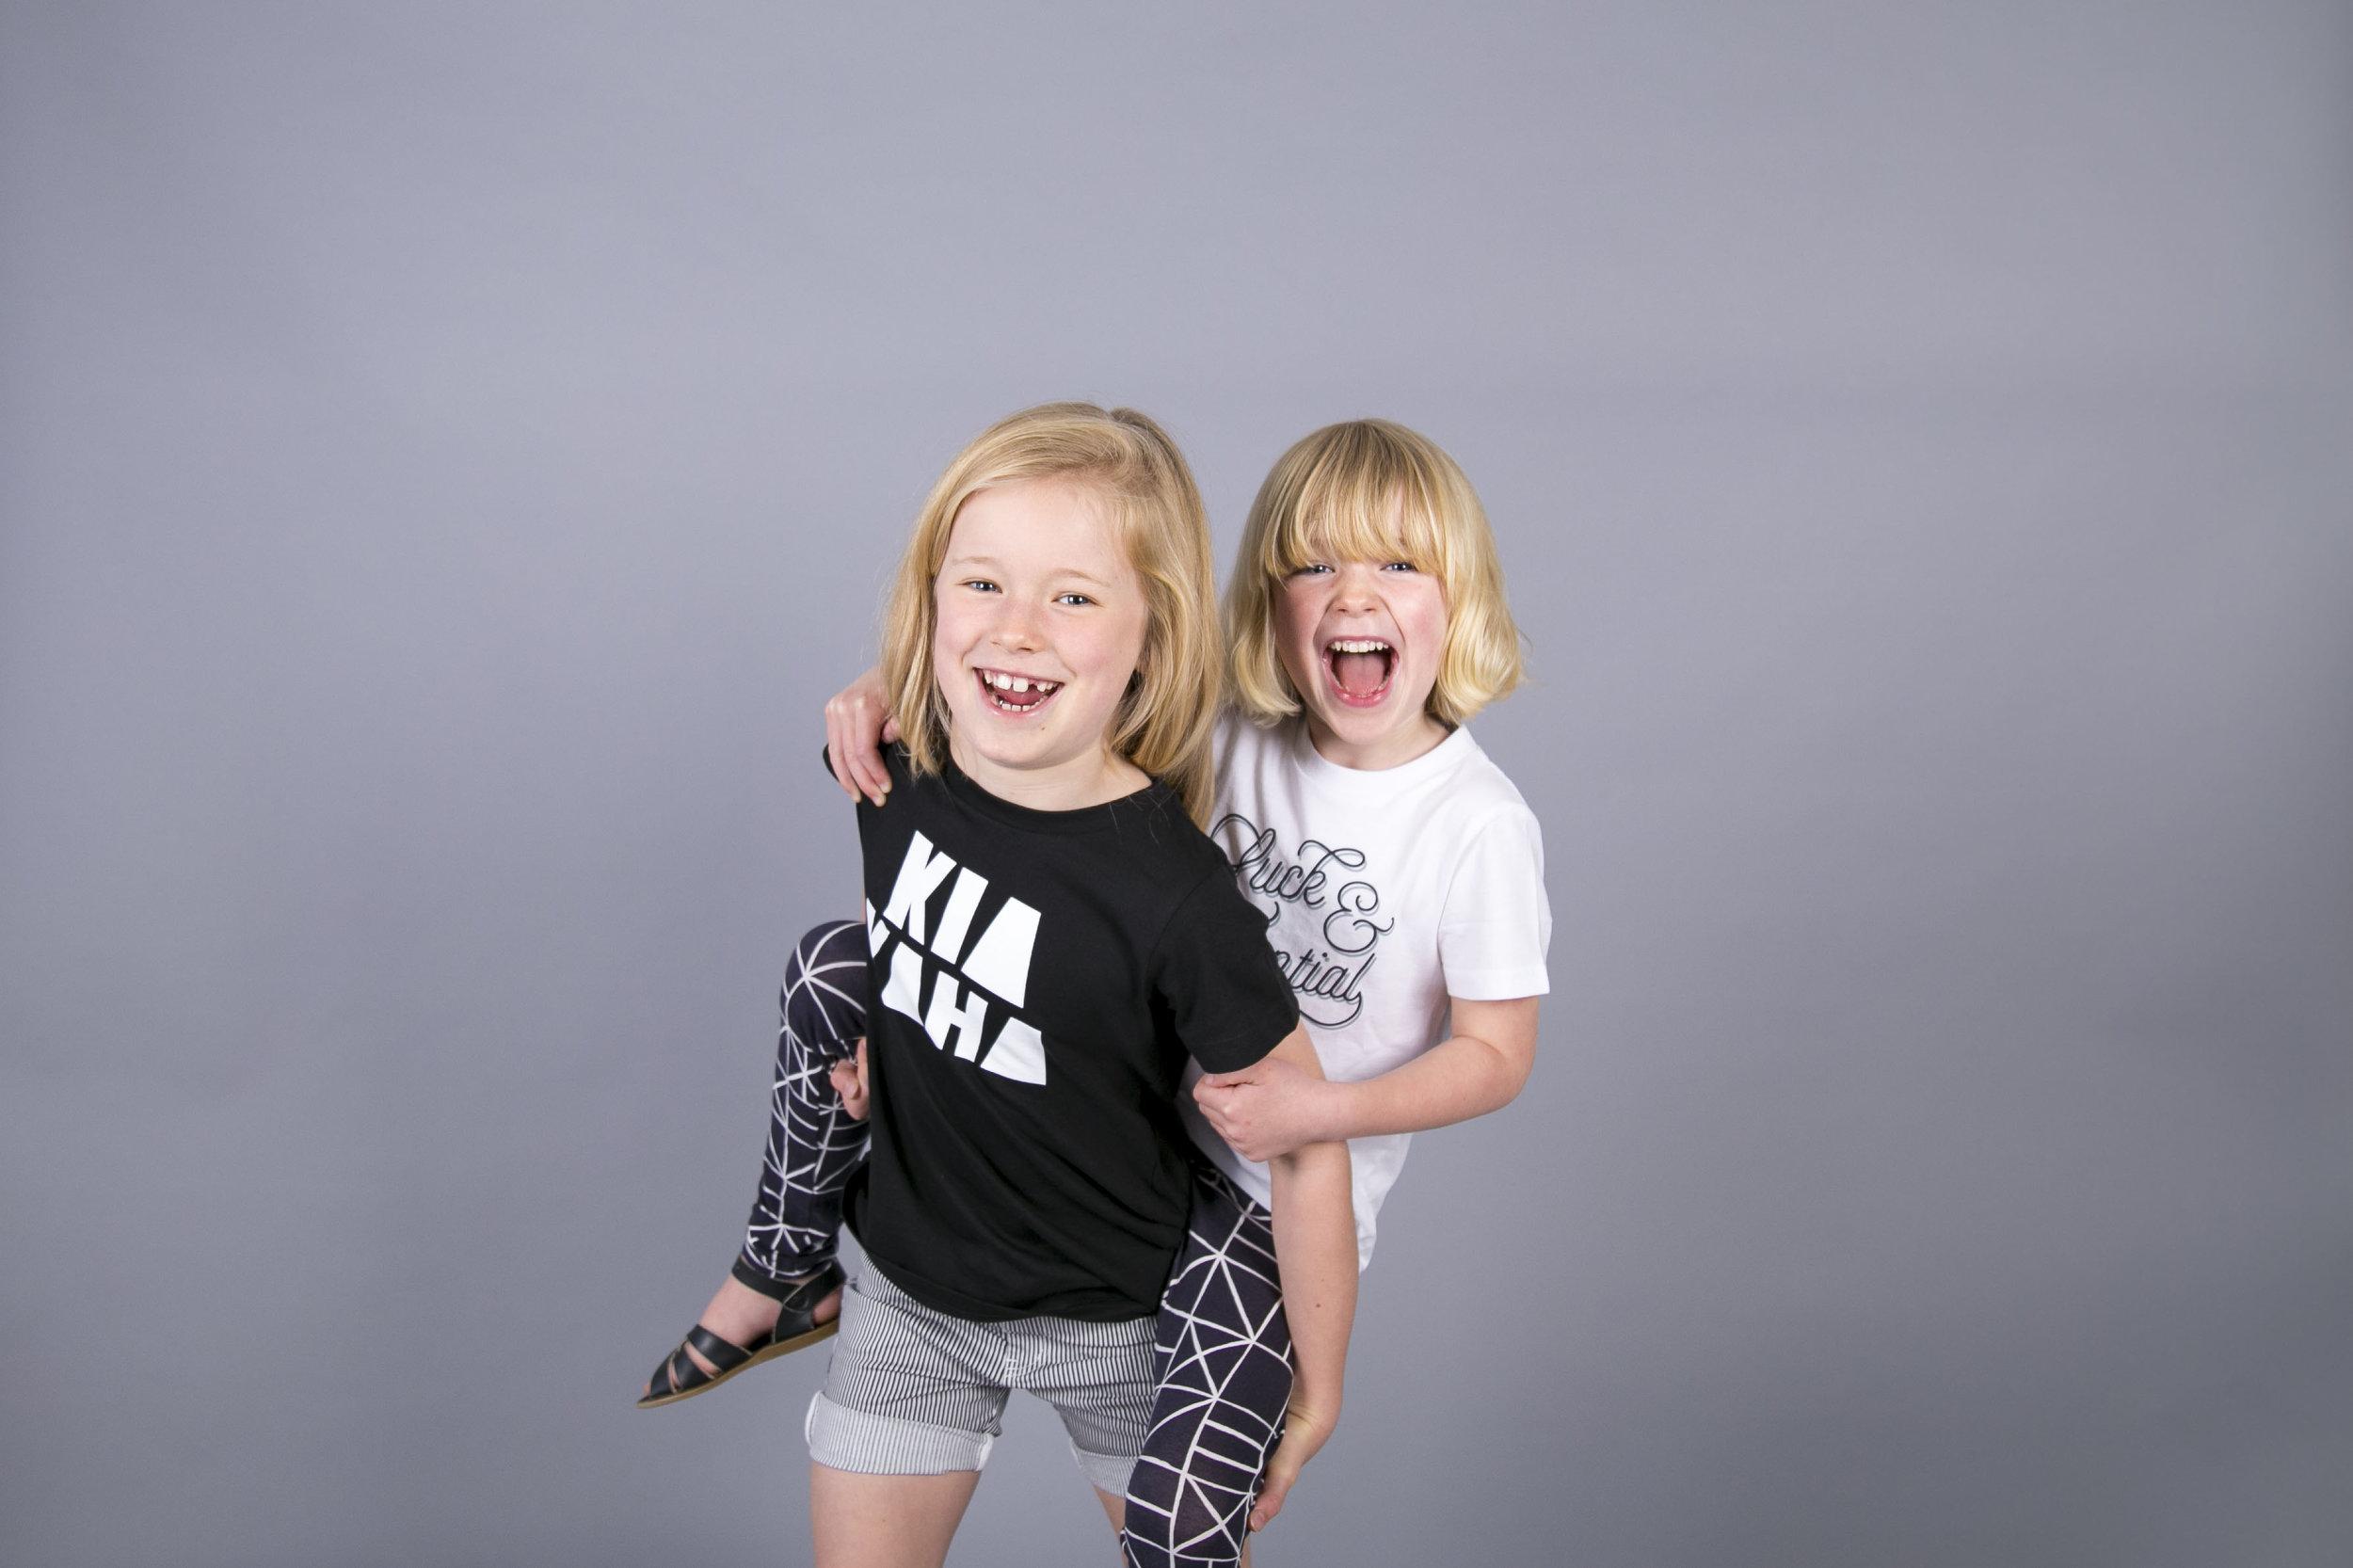 kidkind-6.jpg